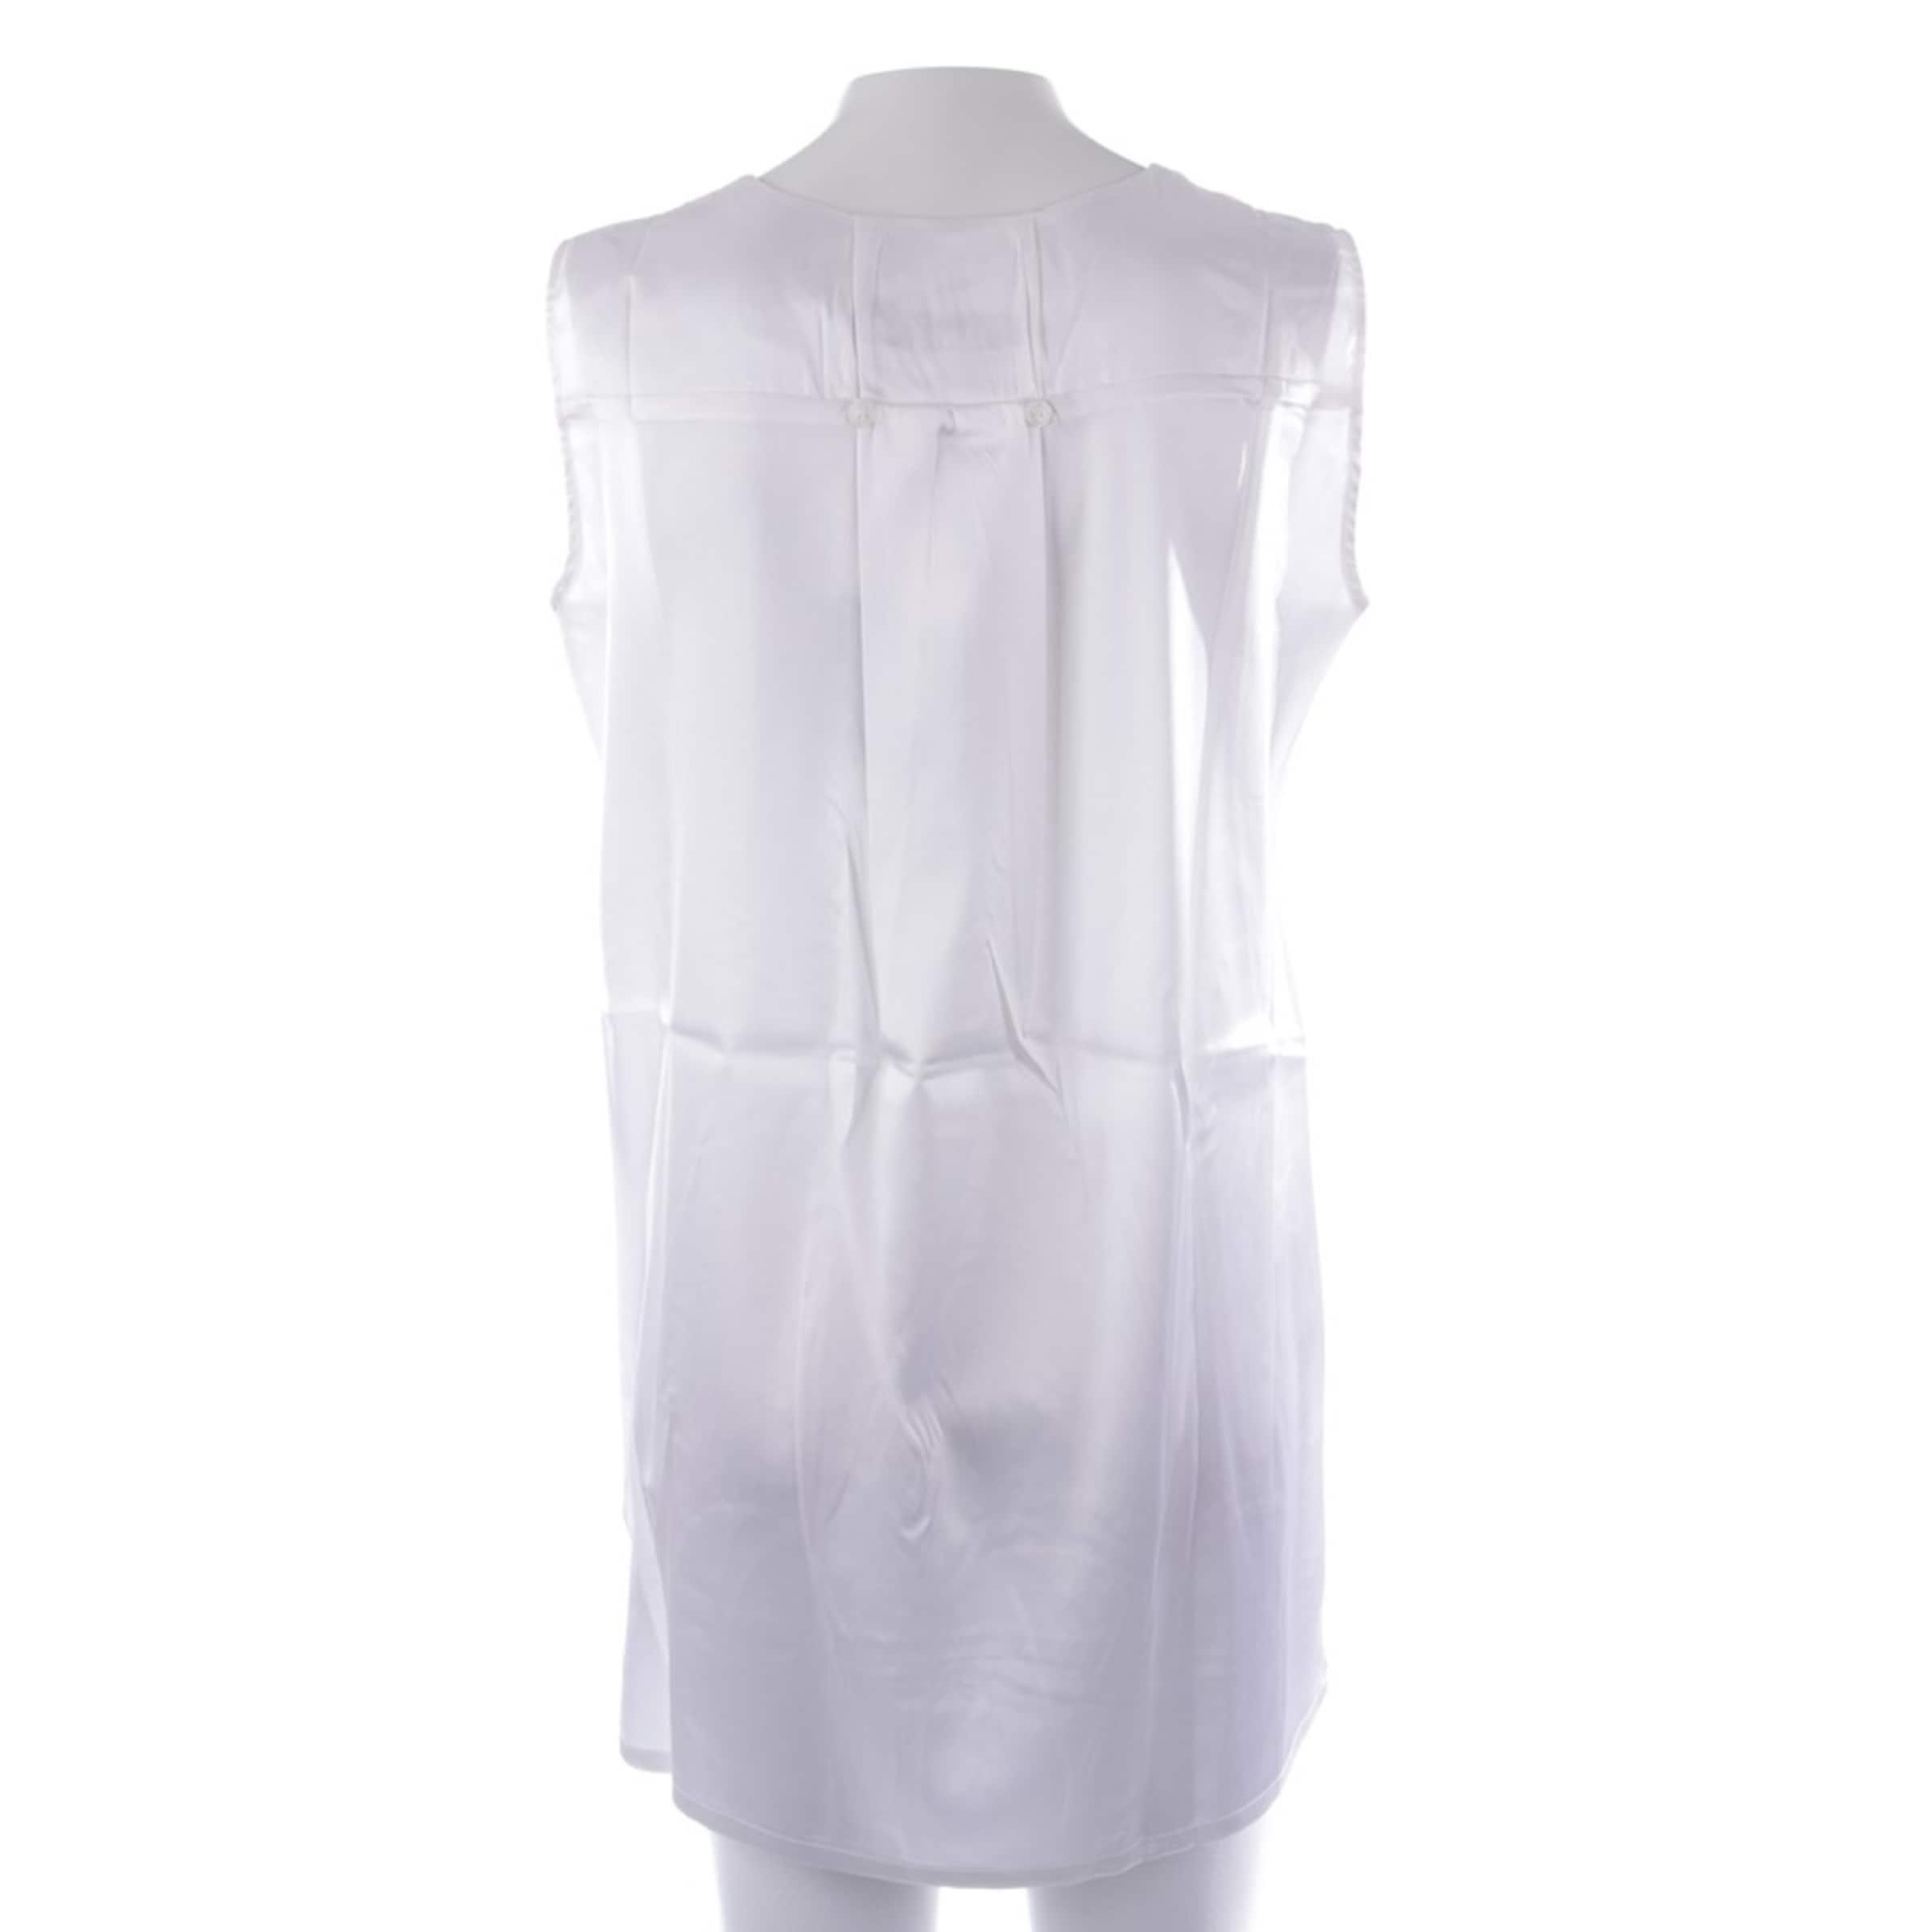 Incentive! Cashmere Seidentop in weiß